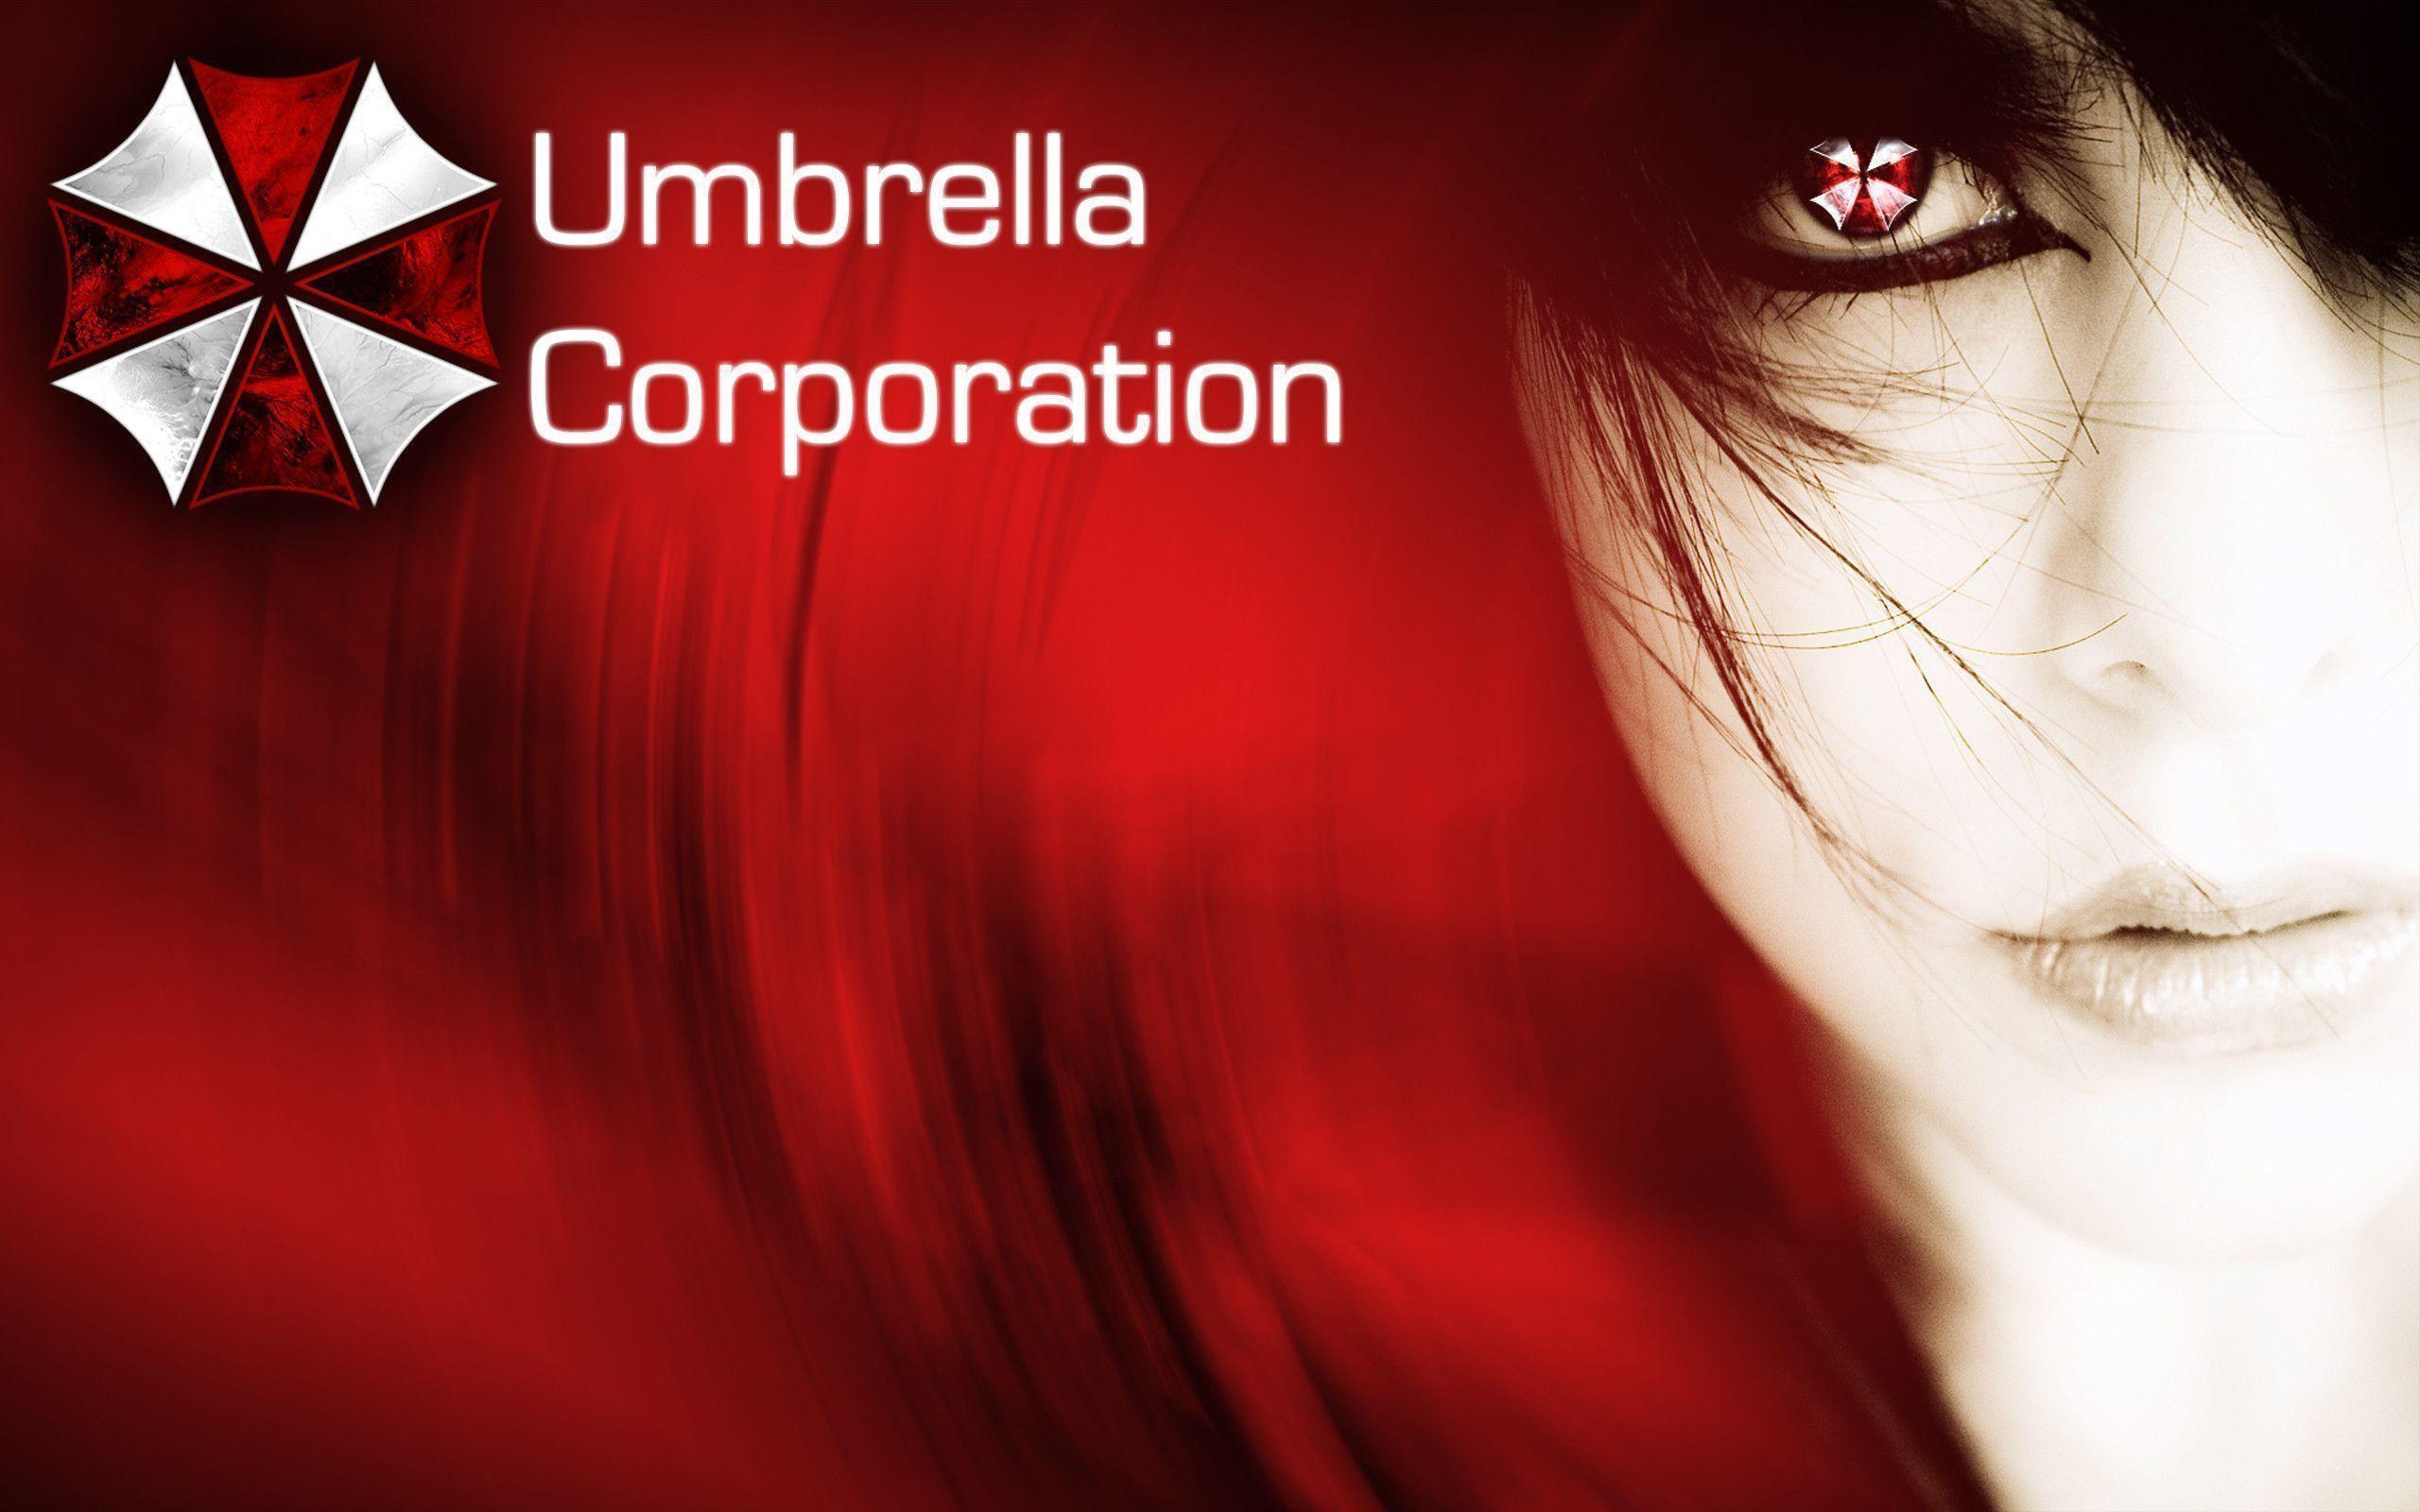 Umbrella Corp. Wallpaper by Arubaru on DeviantArt